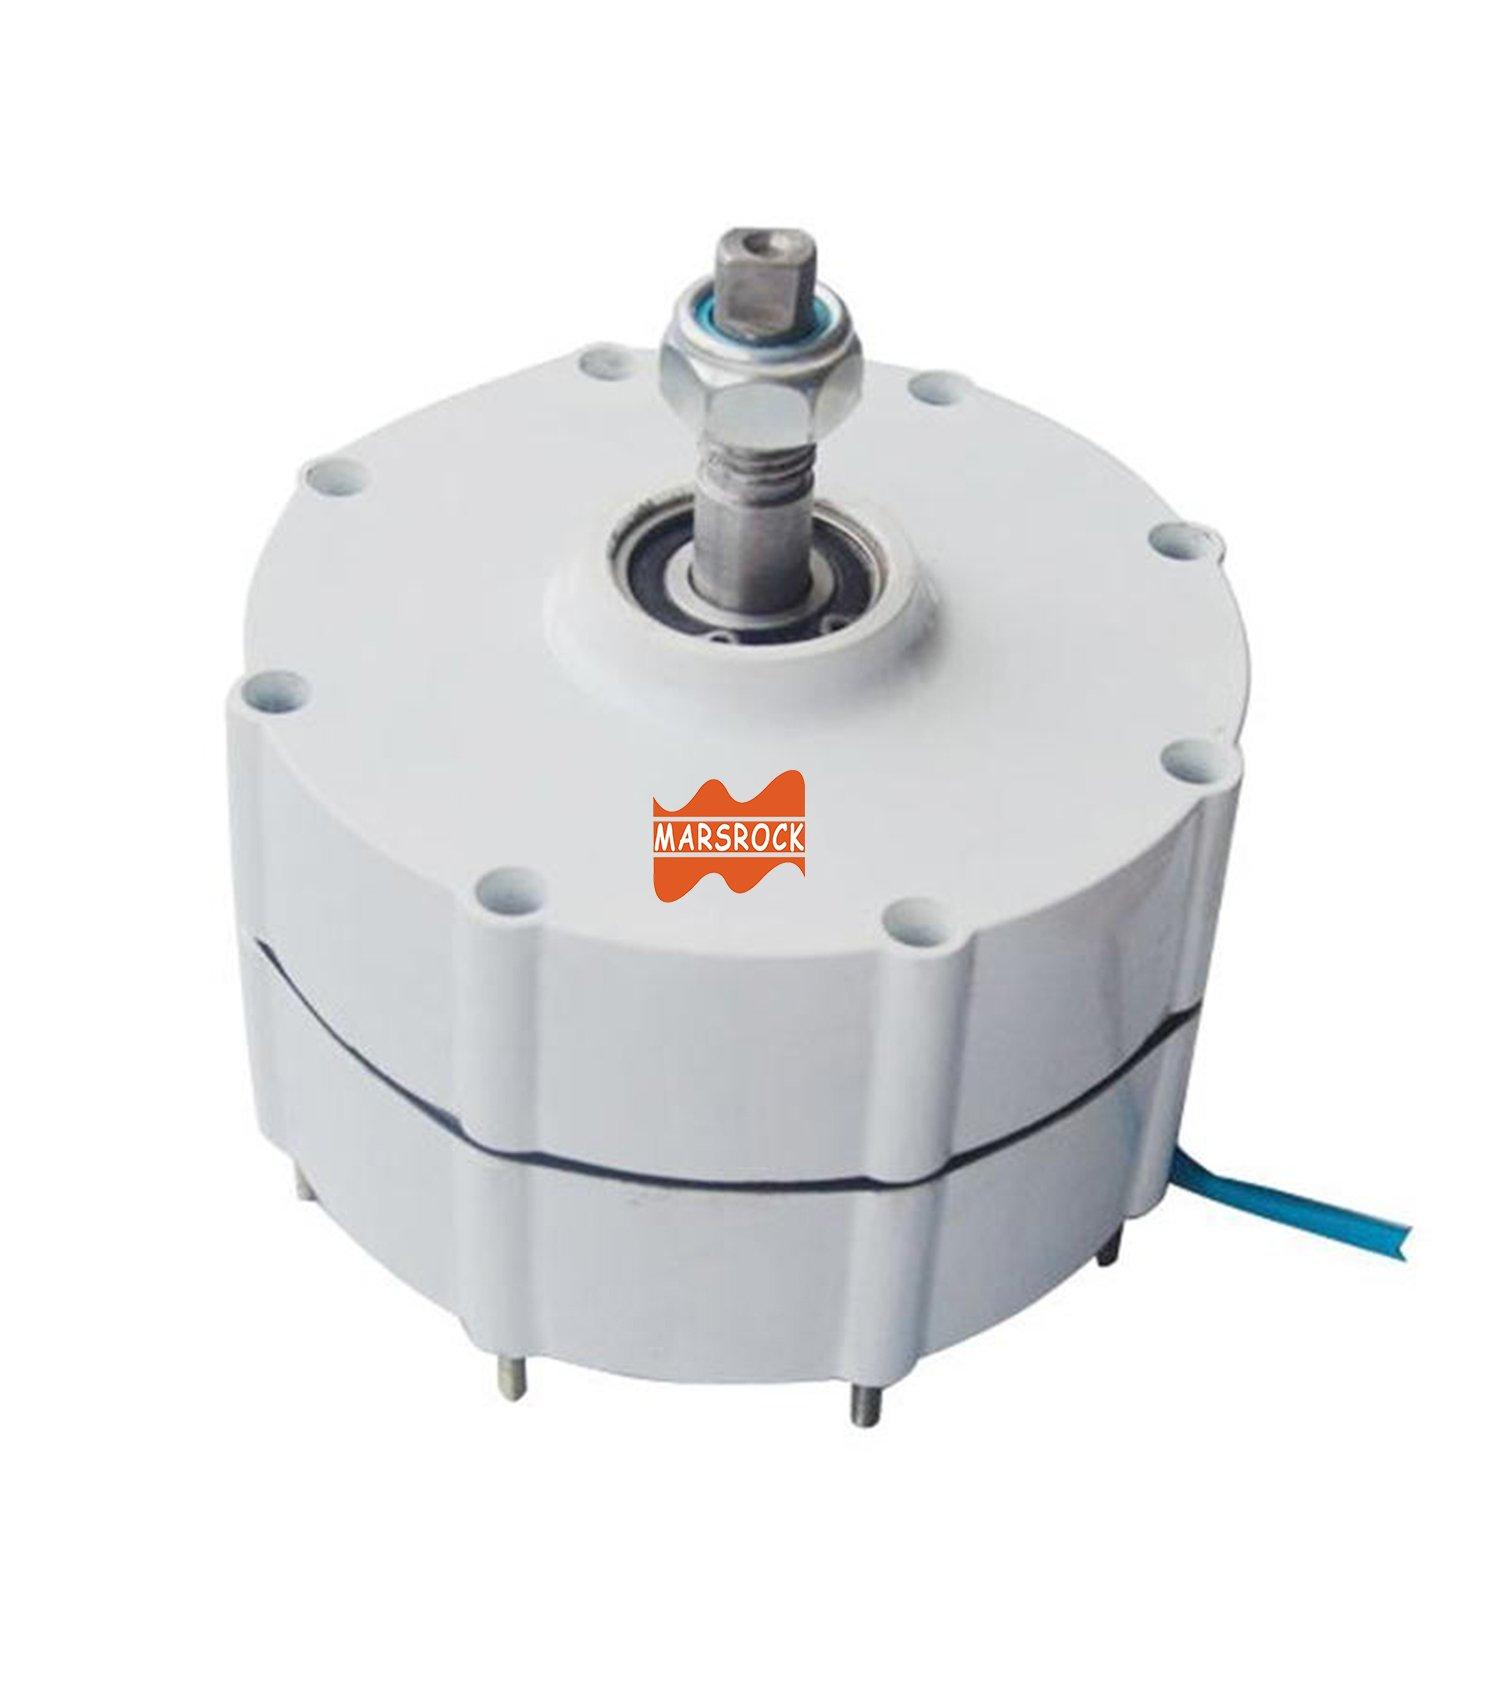 MarsRock 800r/m 600W 12V or 24V Permanent Magnet Generator AC Alternator for Vertical or Horizontal Wind Turbine 600W Wind Generator (48V)